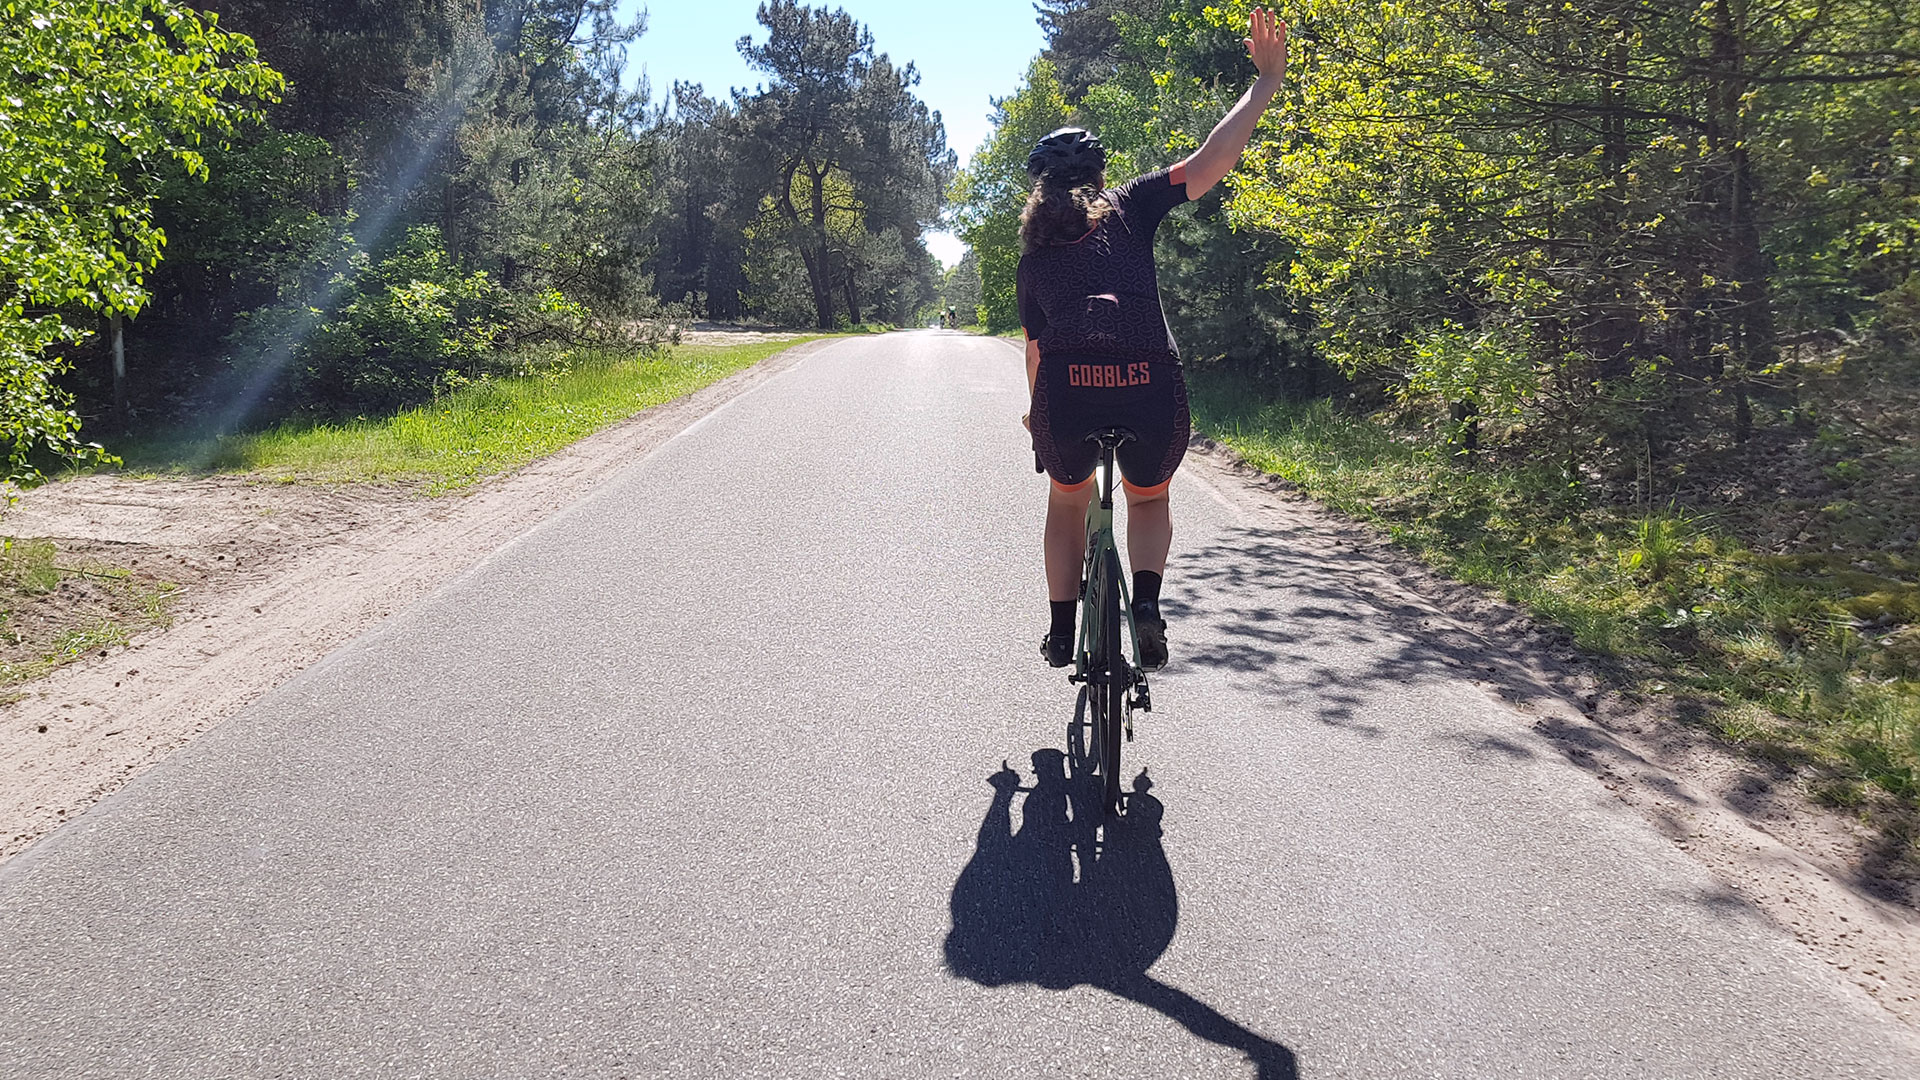 Vijf dingen die je niet wil horen als beginnende wielrenner